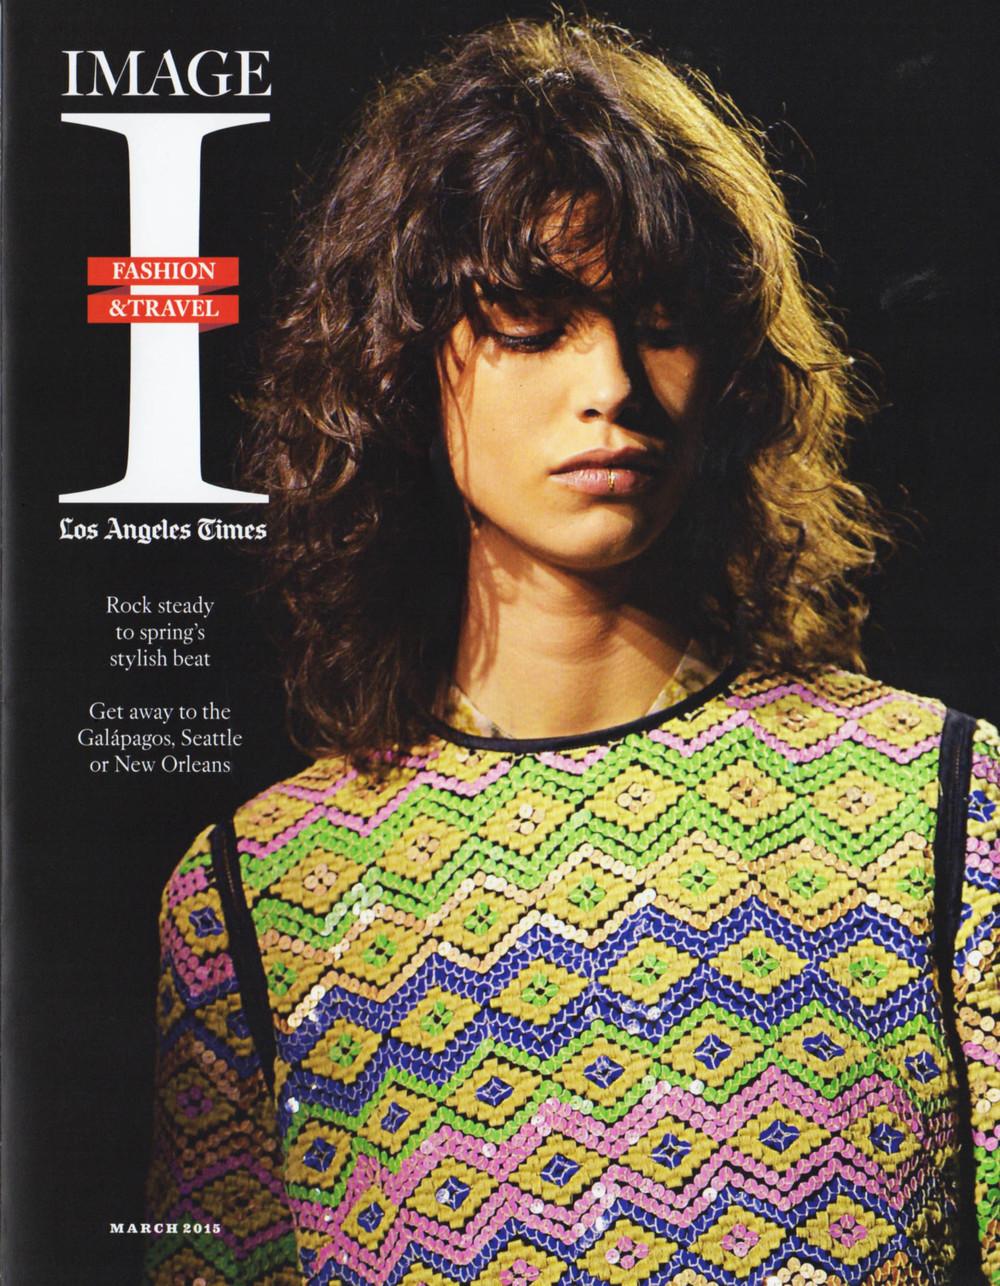 LA Times Image Magazine